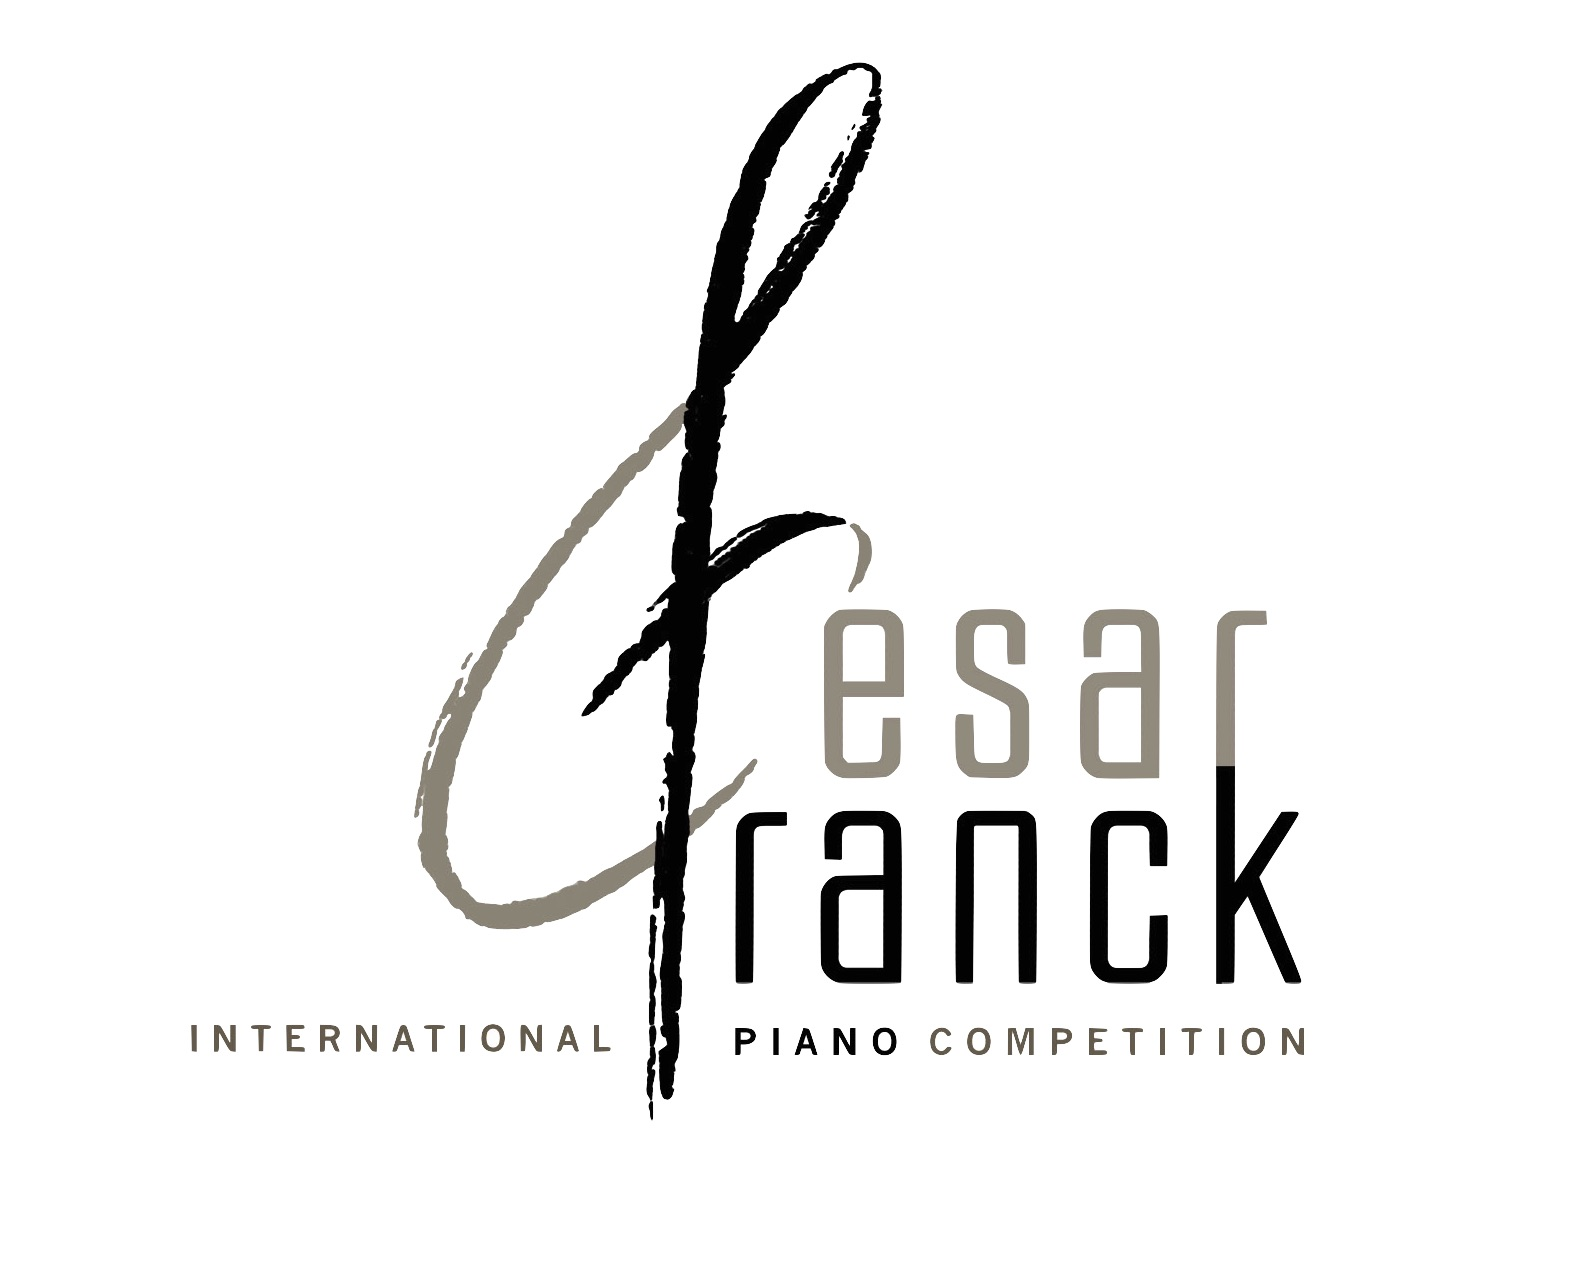 César Franck International Piano Competition -